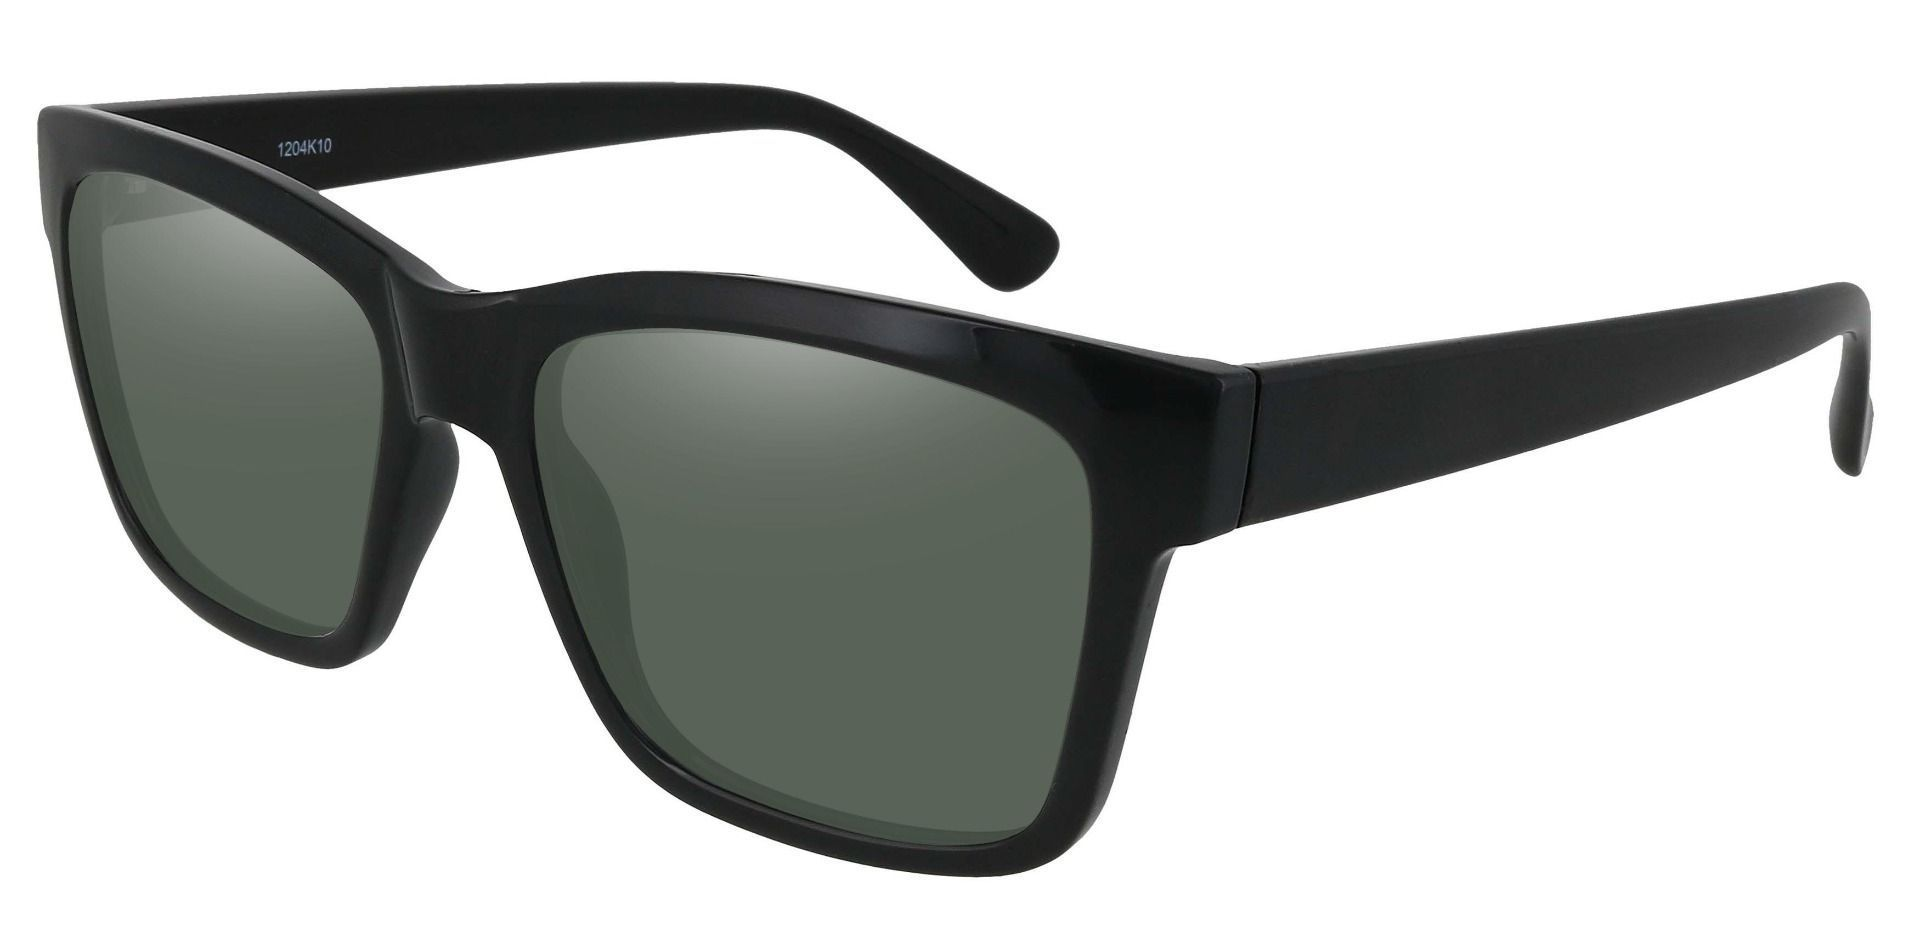 Brinley Square Prescription Sunglasses - Black Frame With Green Lenses